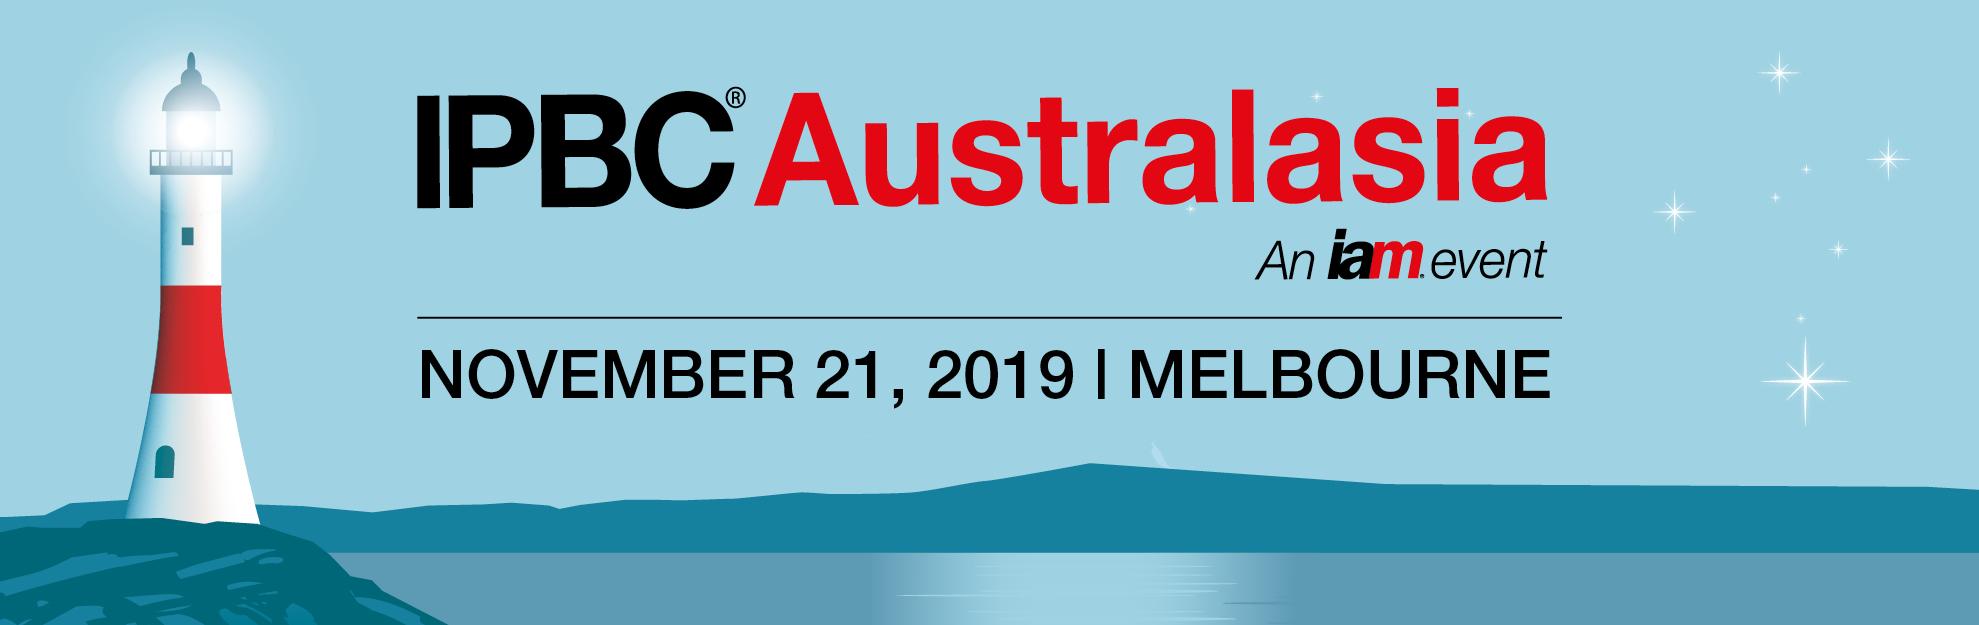 IPBC Australasia 2019